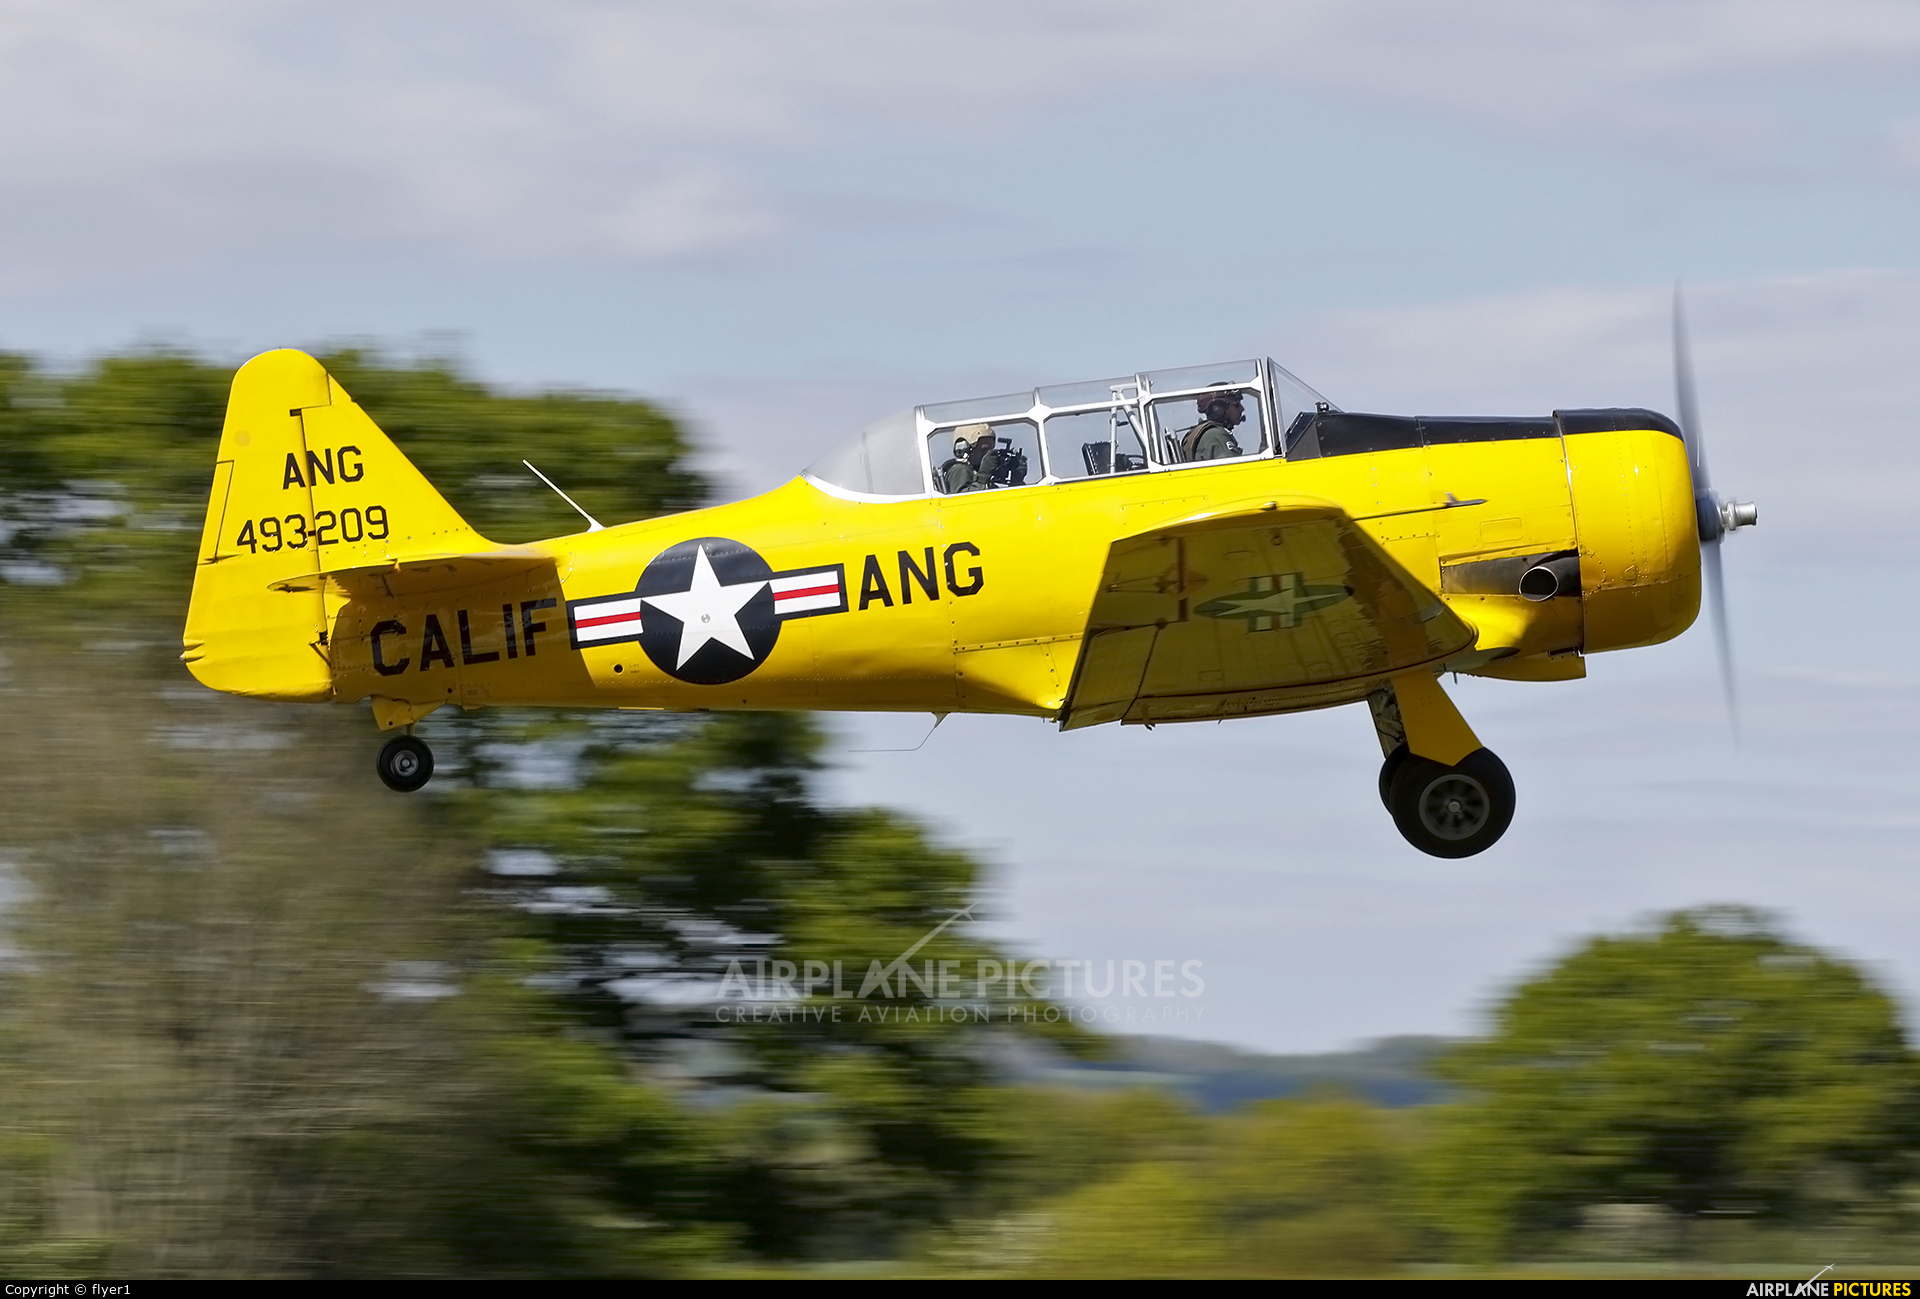 Aero Legends G-DDMV aircraft at Lashenden / Headcorn